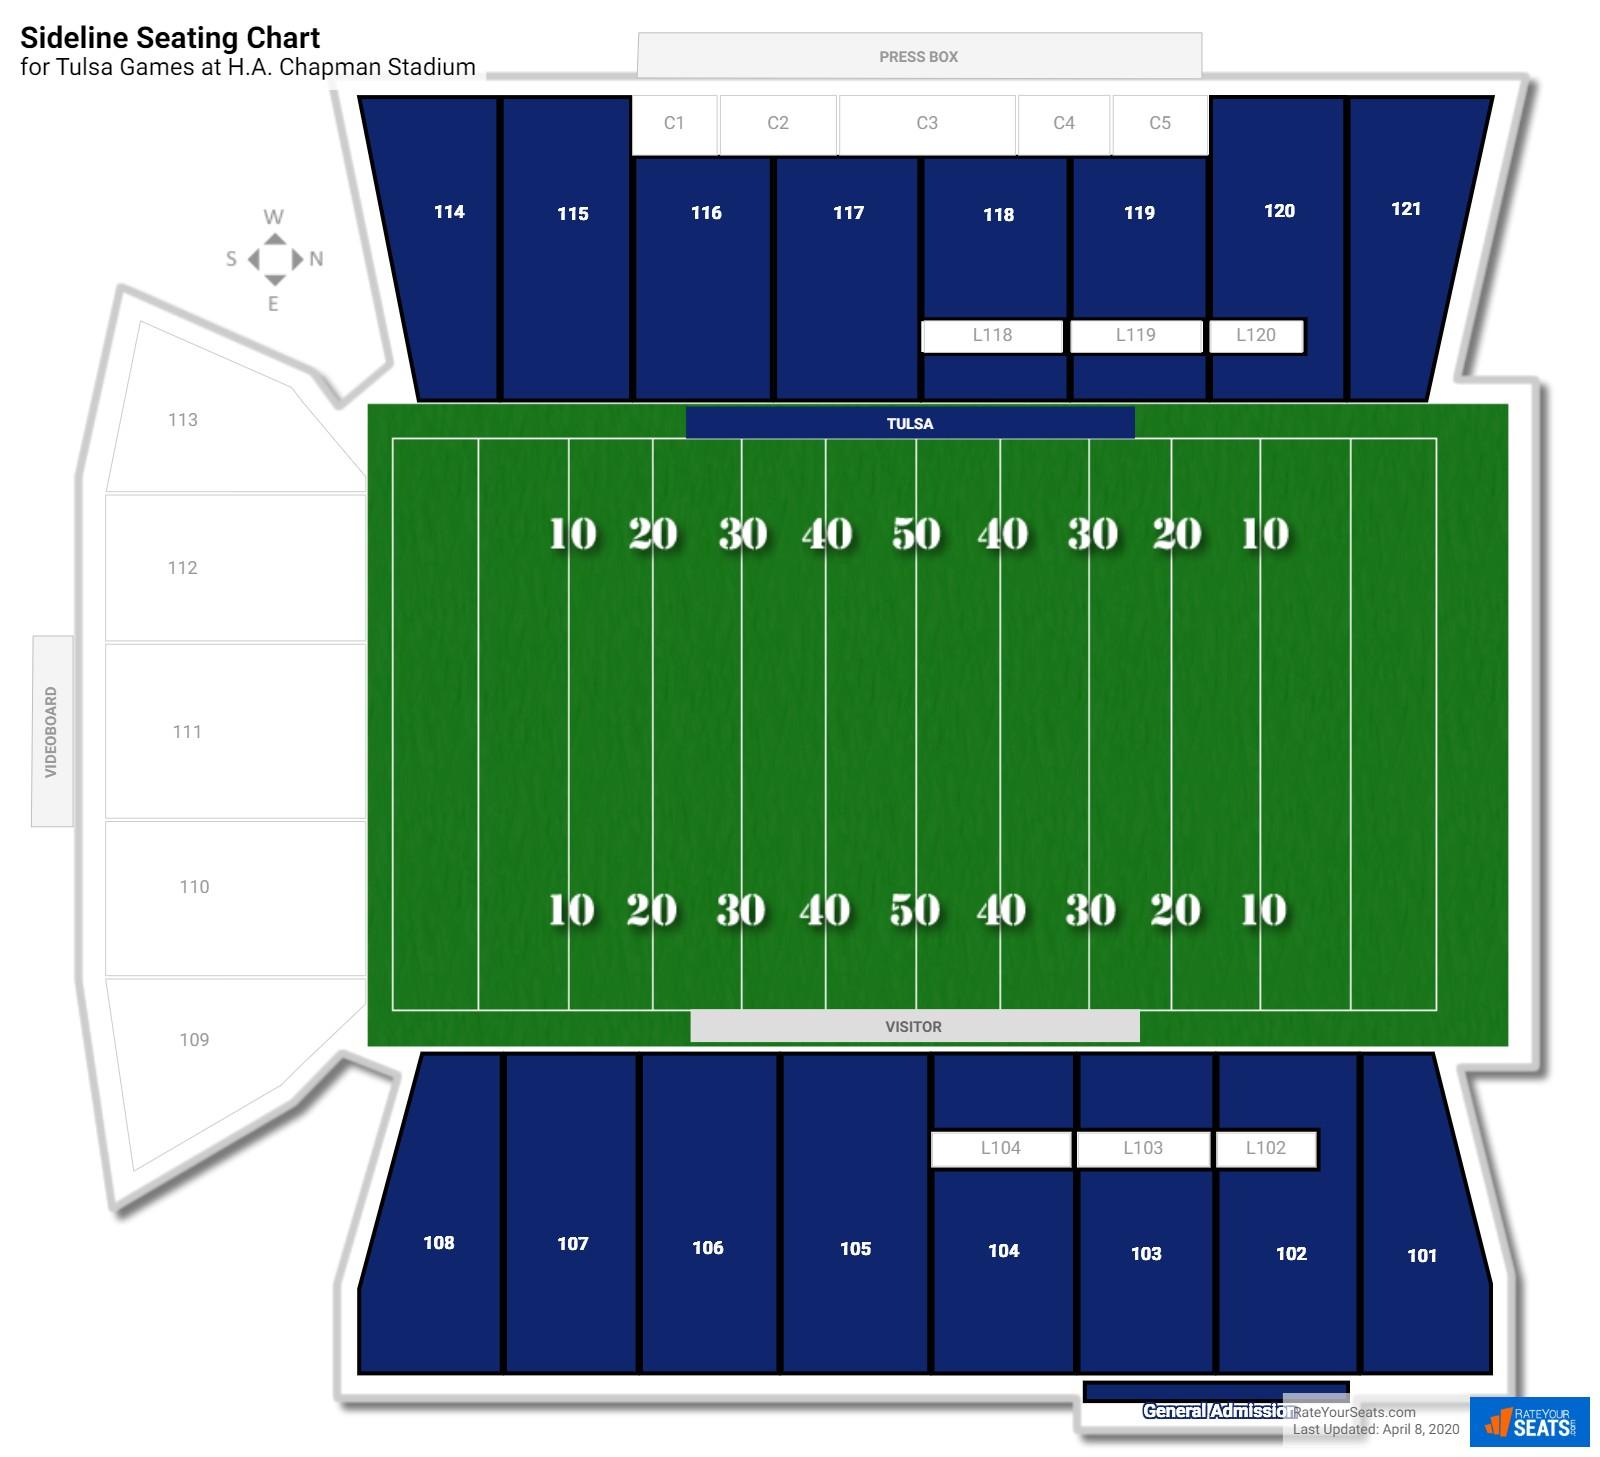 H.A. Chapman Stadium (Tulsa) Seating Guide - RateYourSeats.com